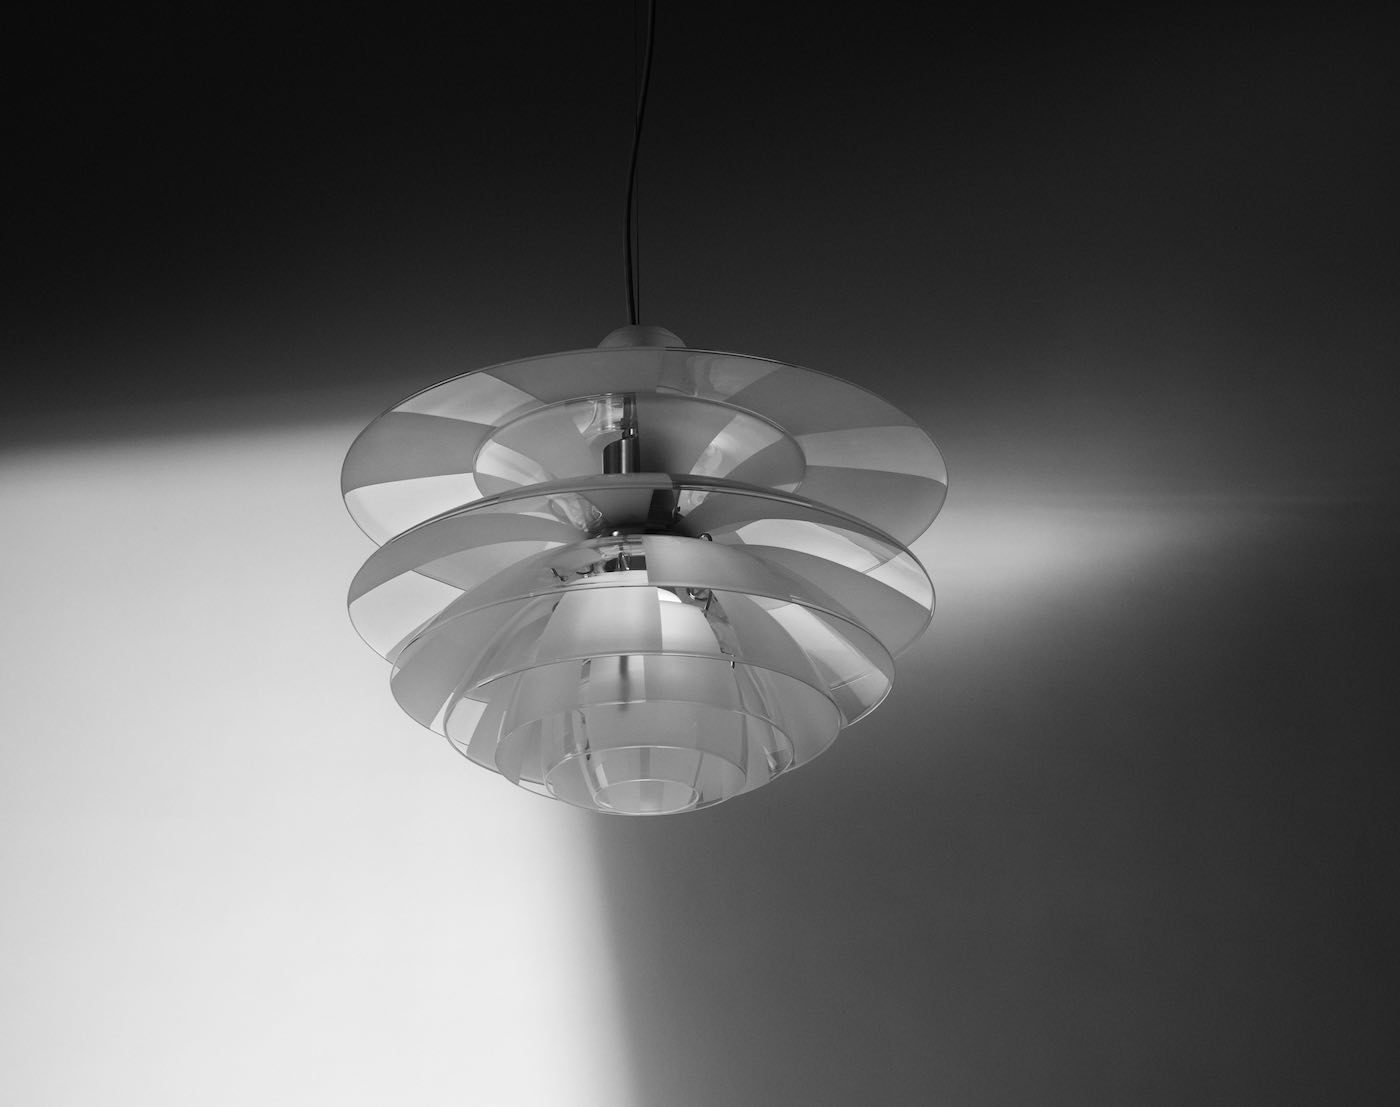 Louis Poulsen, Glasleuchte, PH Septima, Design-Klassiker, Poul Henningsen